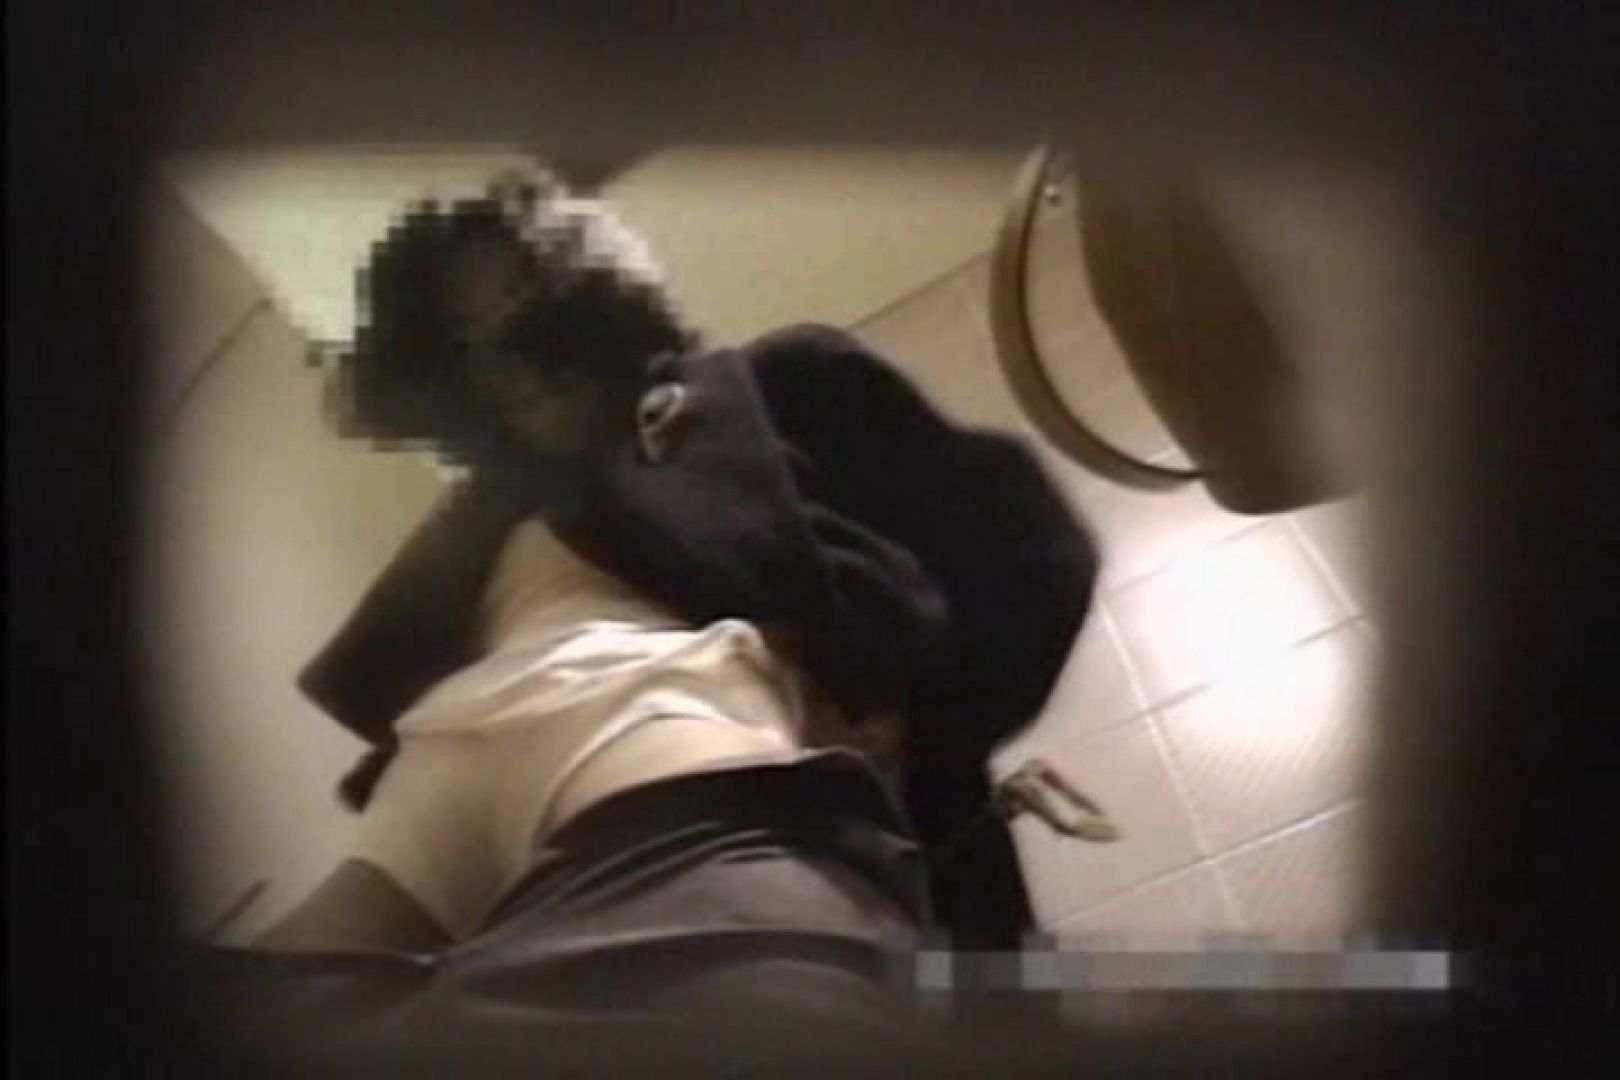 STY-013 実録!2カメde女子洗面所 洗面所 盗み撮り動画 113pic 112